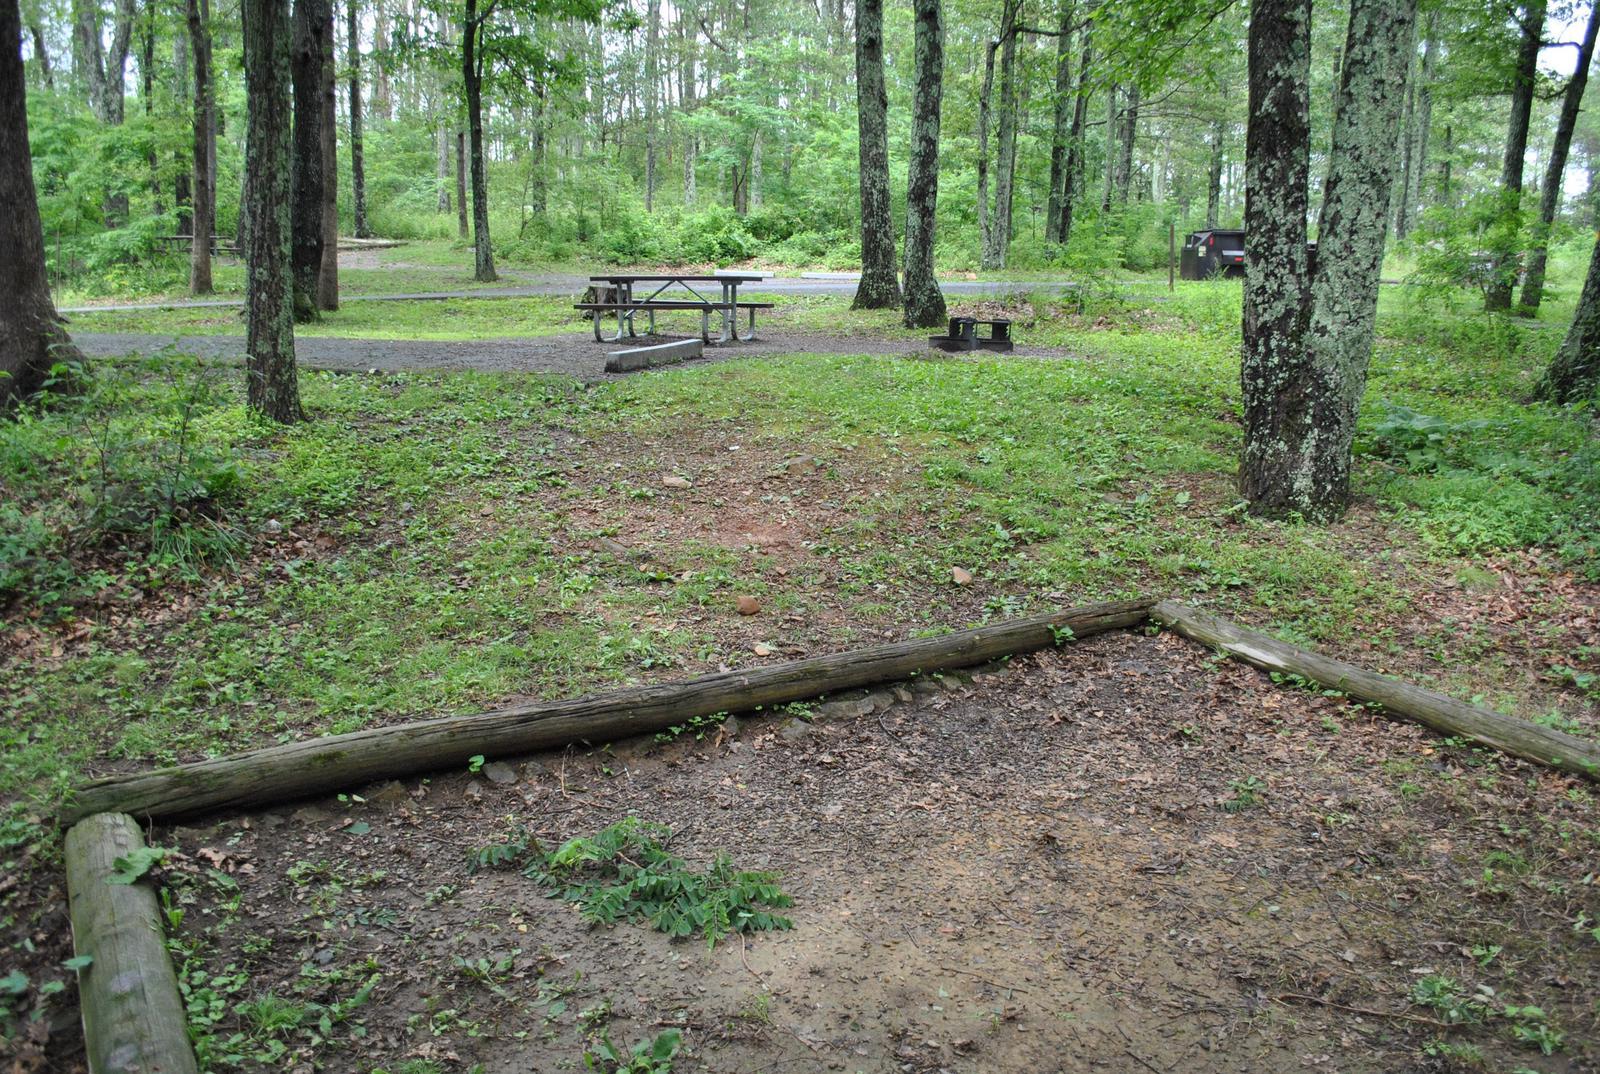 Mathews Arm Campground – Site A067